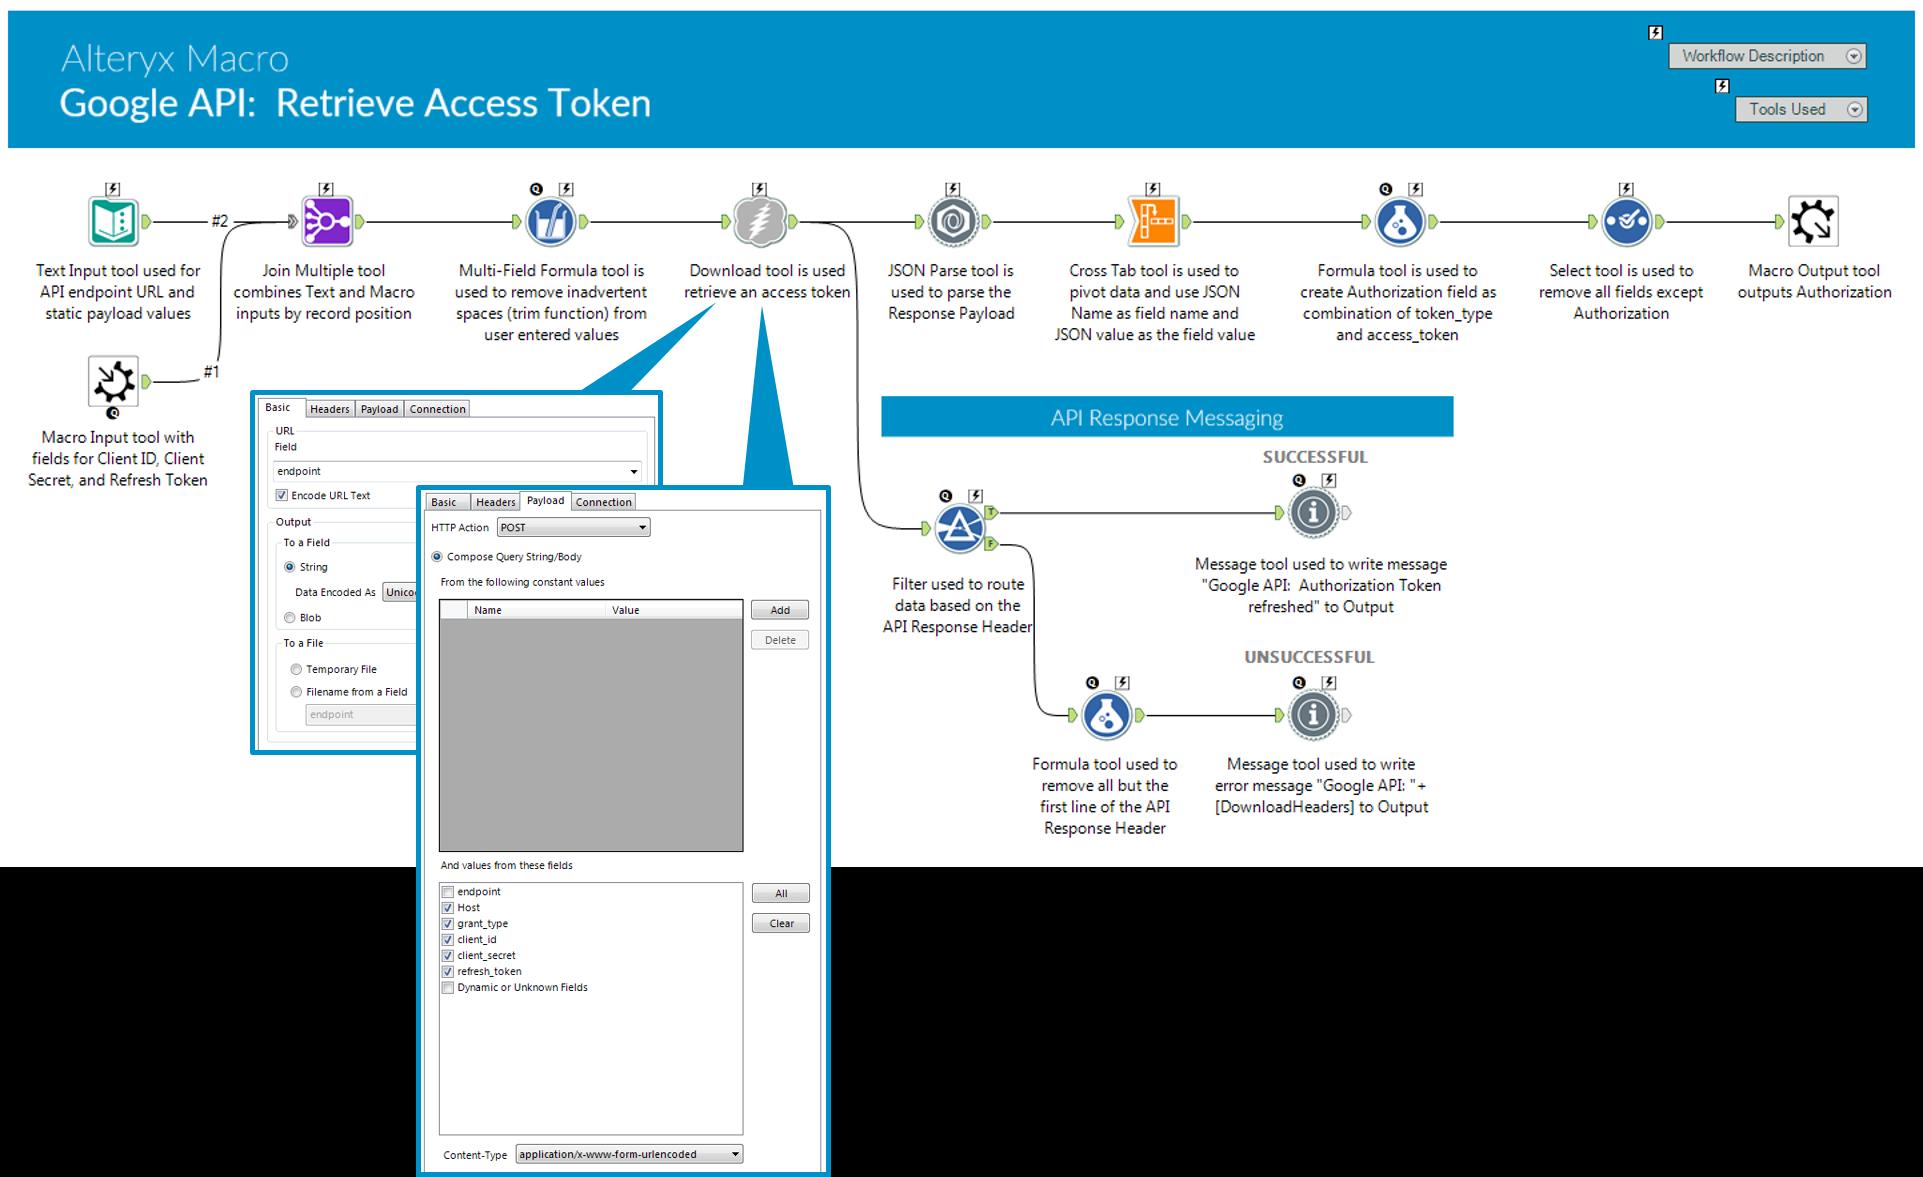 Screenshot of the Google API: Retrieve Access Token macro